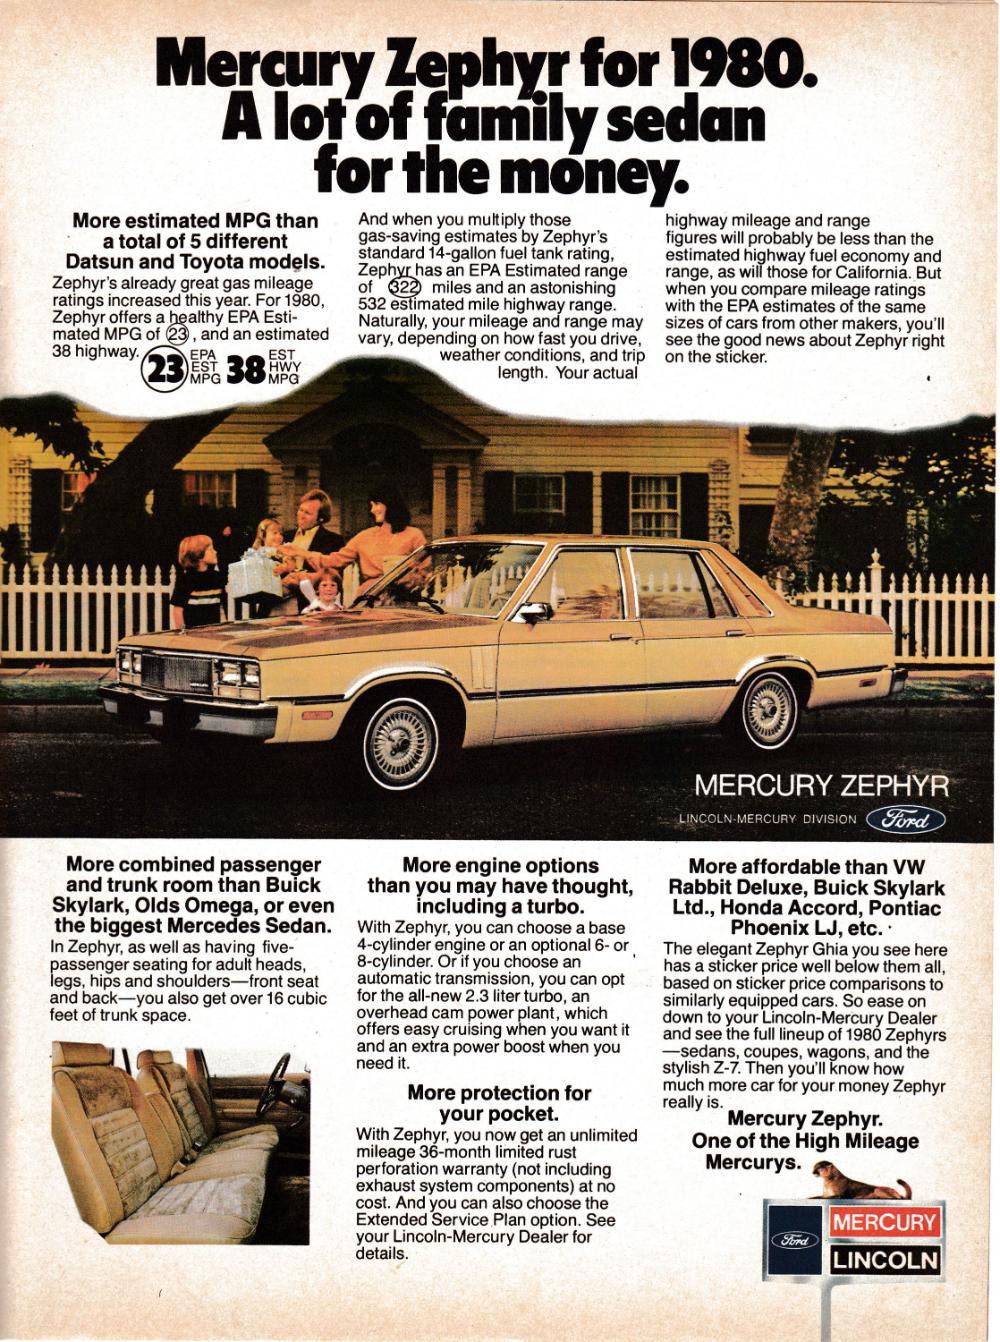 1980 Mercury Zephyr Family Sedan Picket Fence Background Original